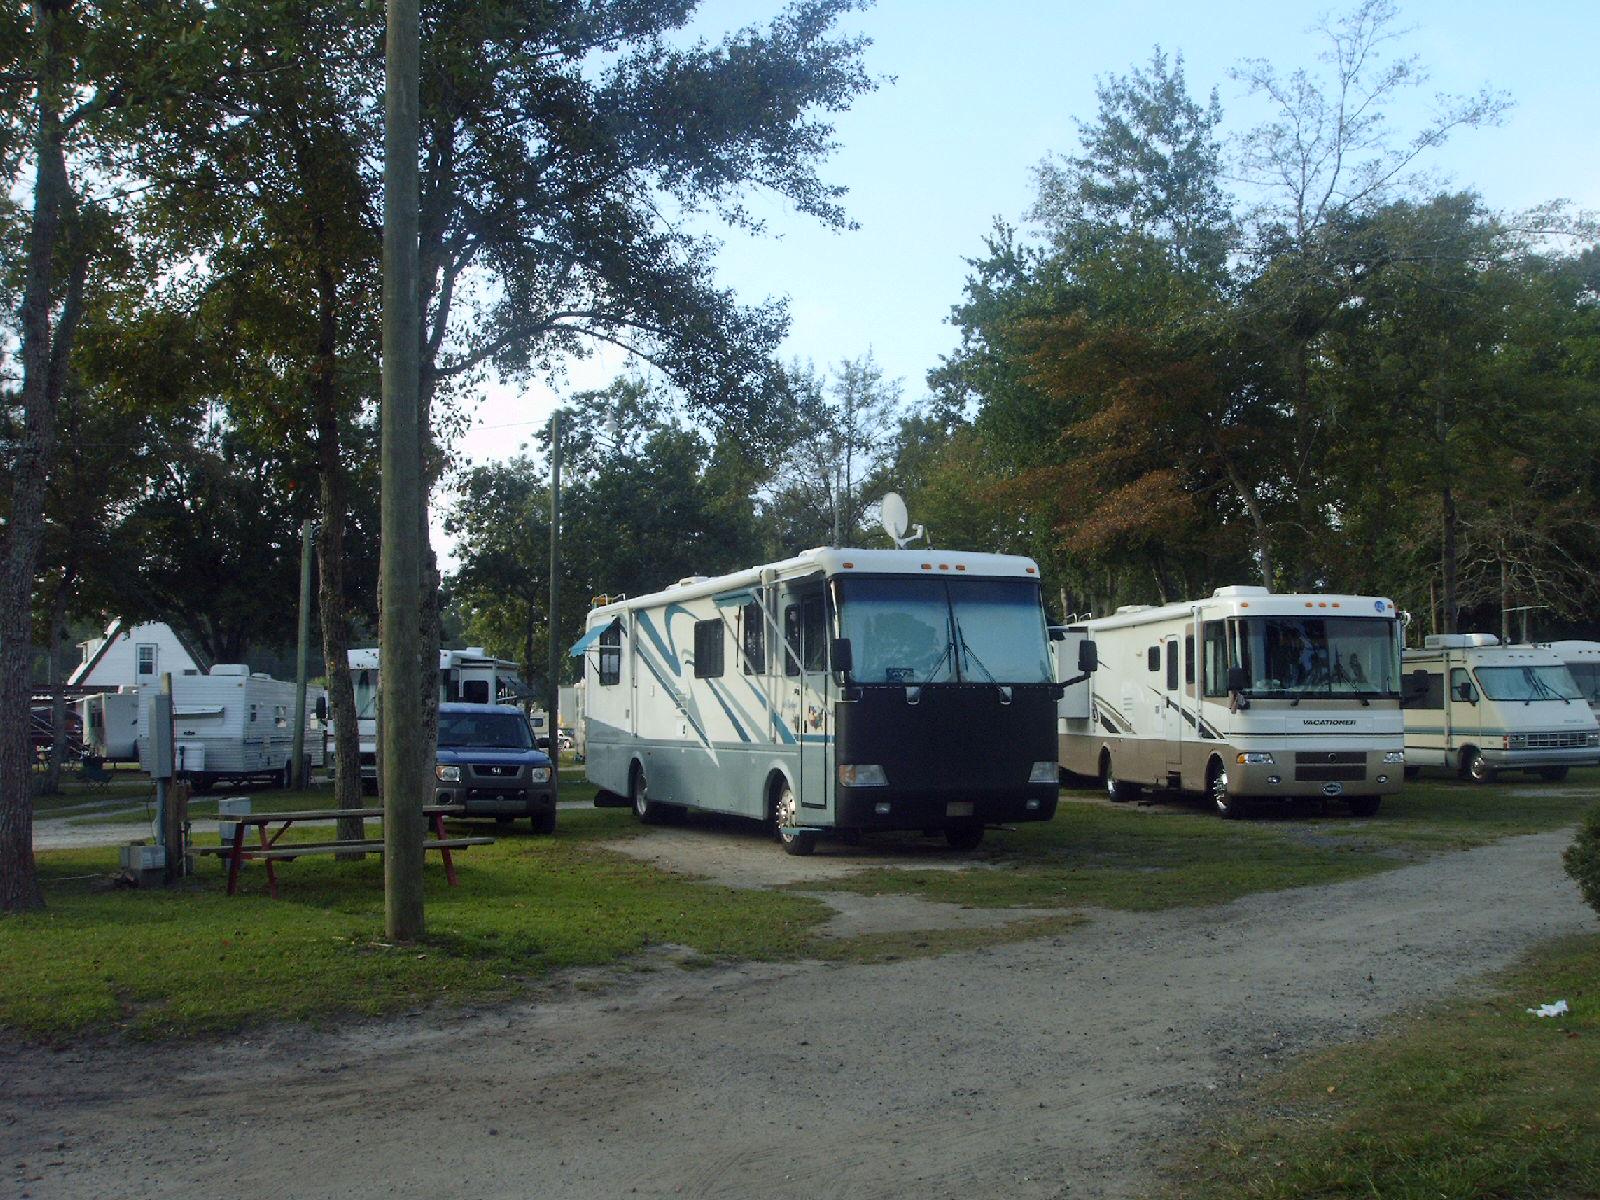 Golden Isles Vacation Park Passport America Camping Amp Rv